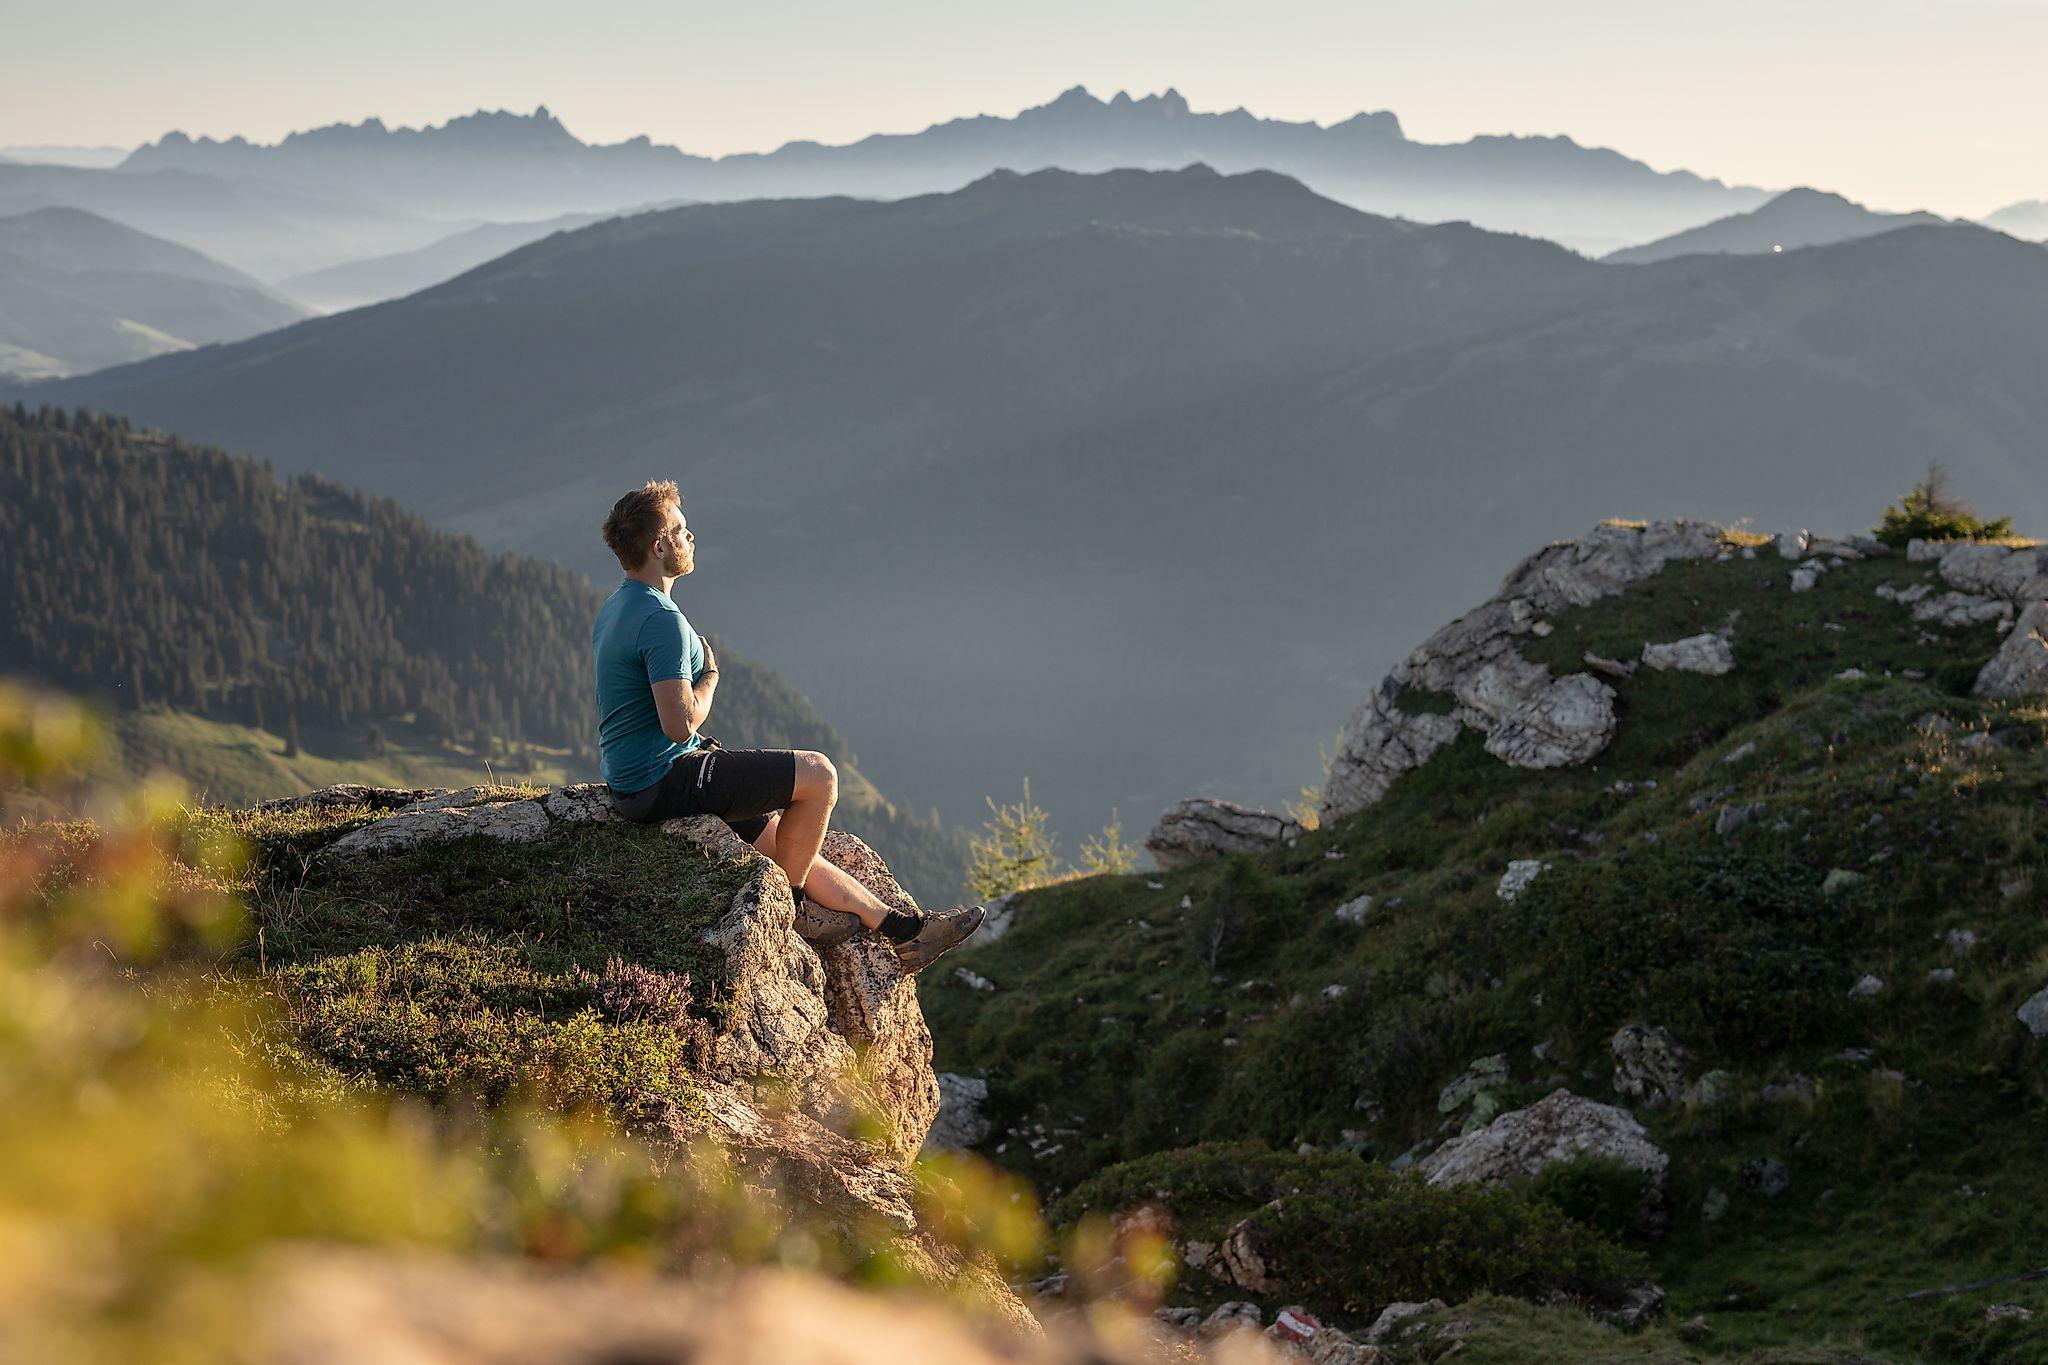 <p>Salzburg summit game - Penkkopf - pause, enjoy nature</p>